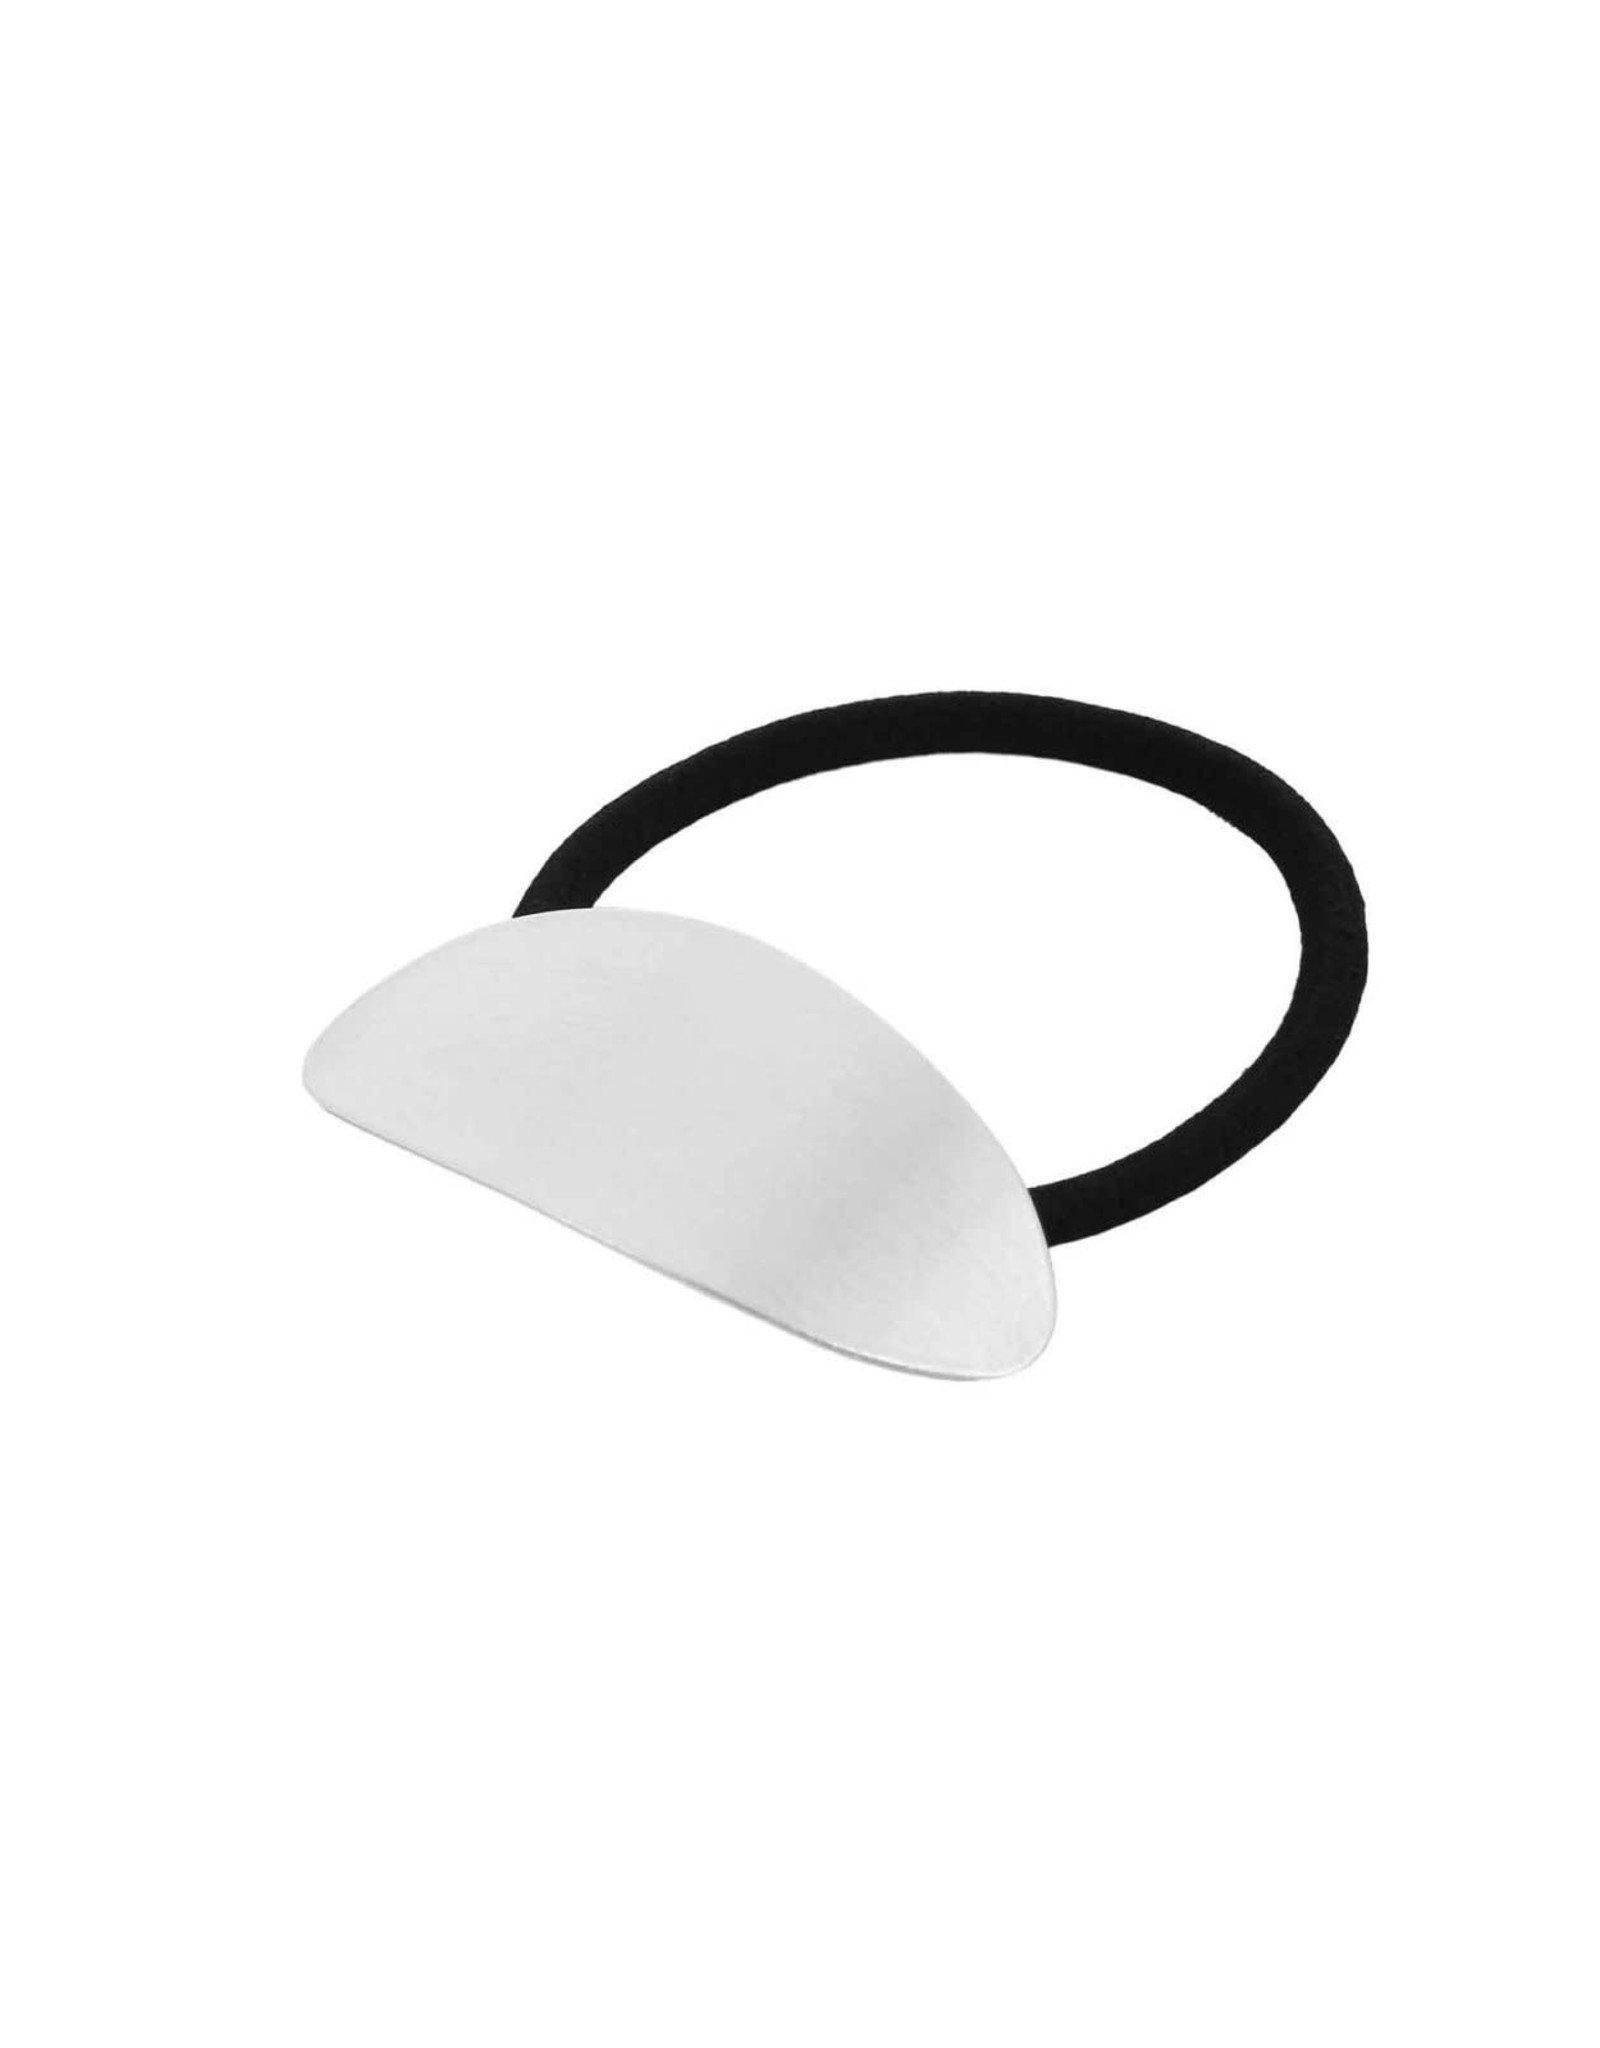 Dansk Dansk 4C3017 Oval hair elastic rhodium plating